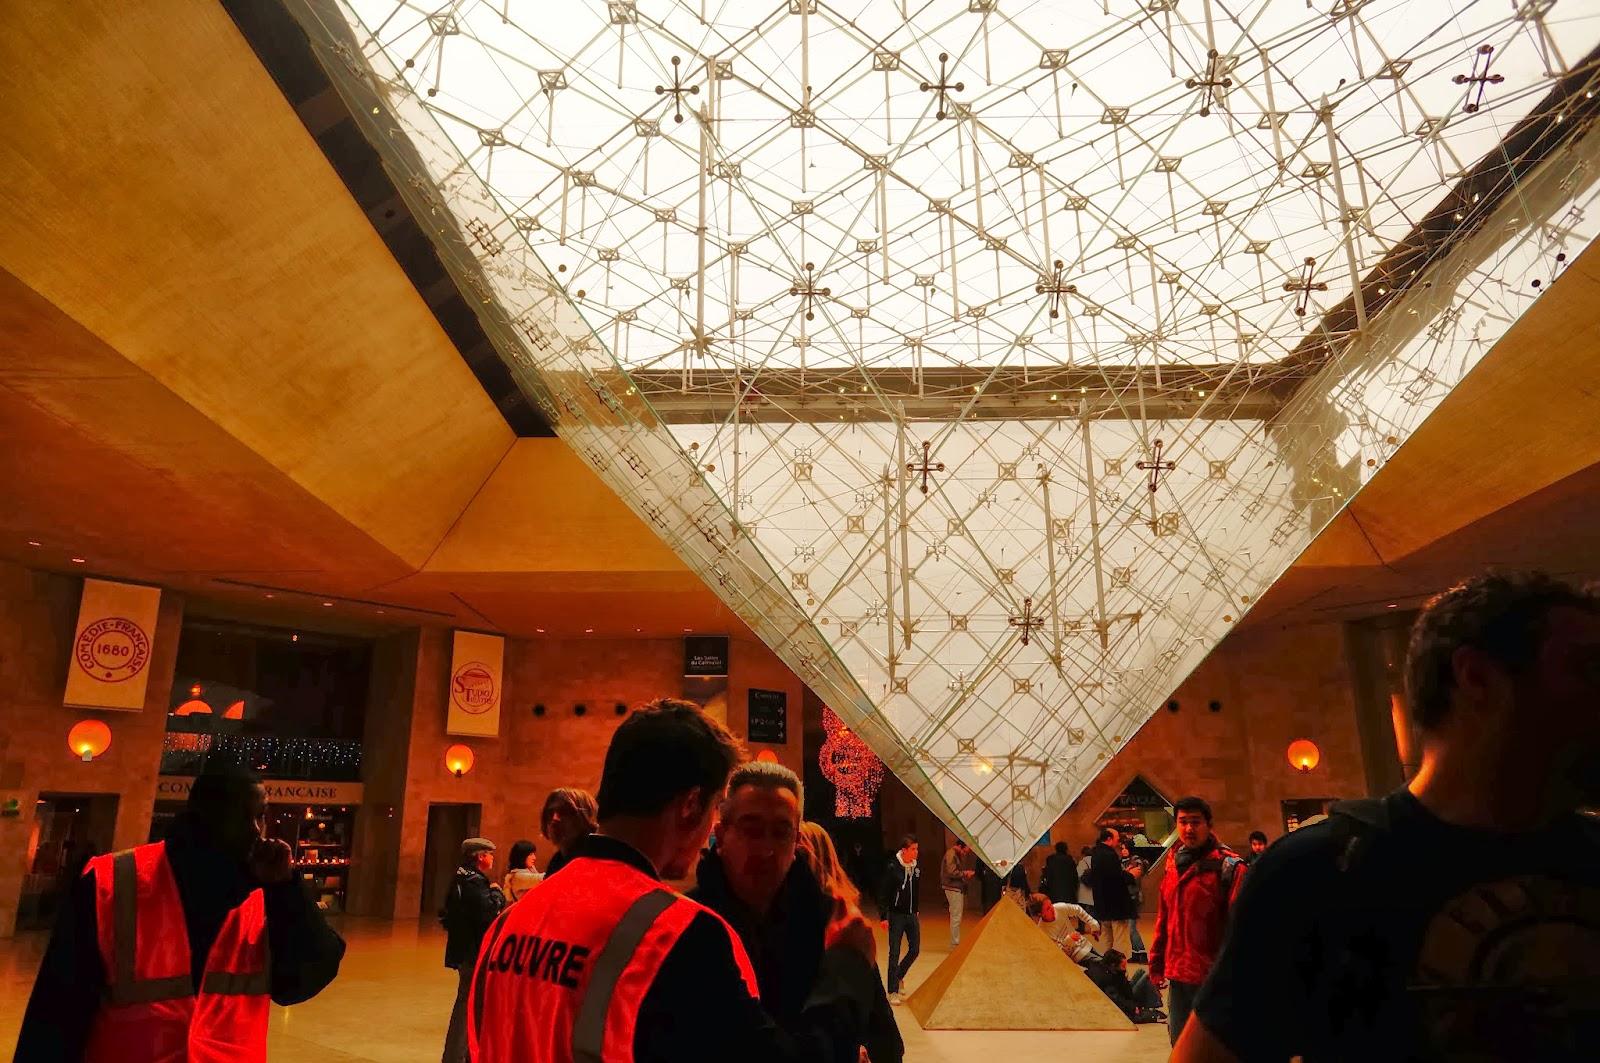 Пирамида Лувра изнутри